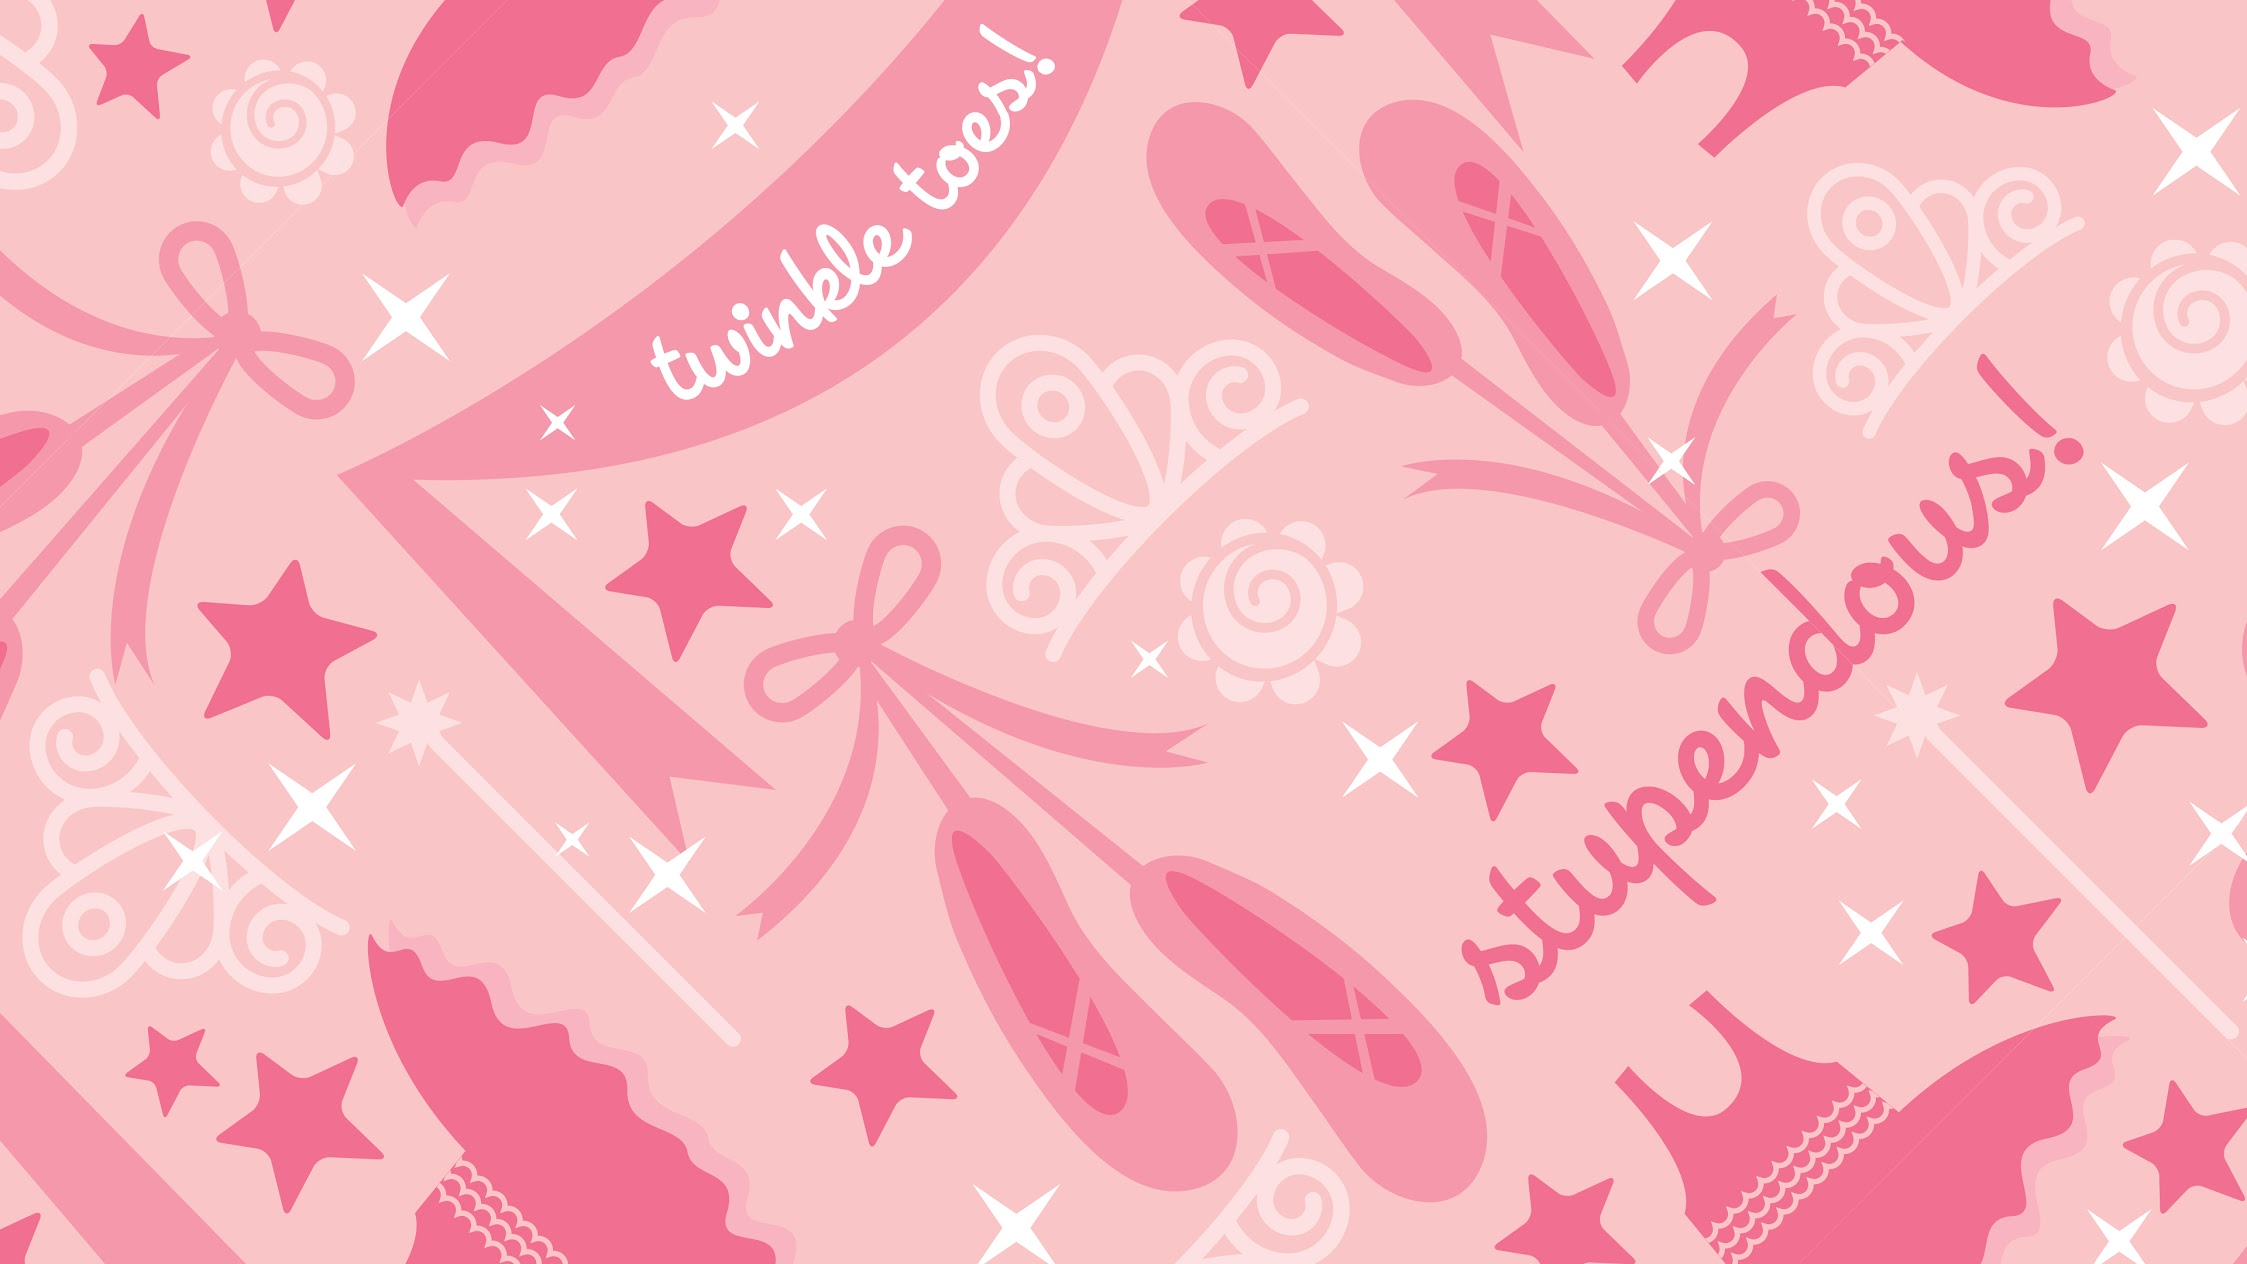 High Resolution Wallpaper | Angelina Balerina 2247x1264 px